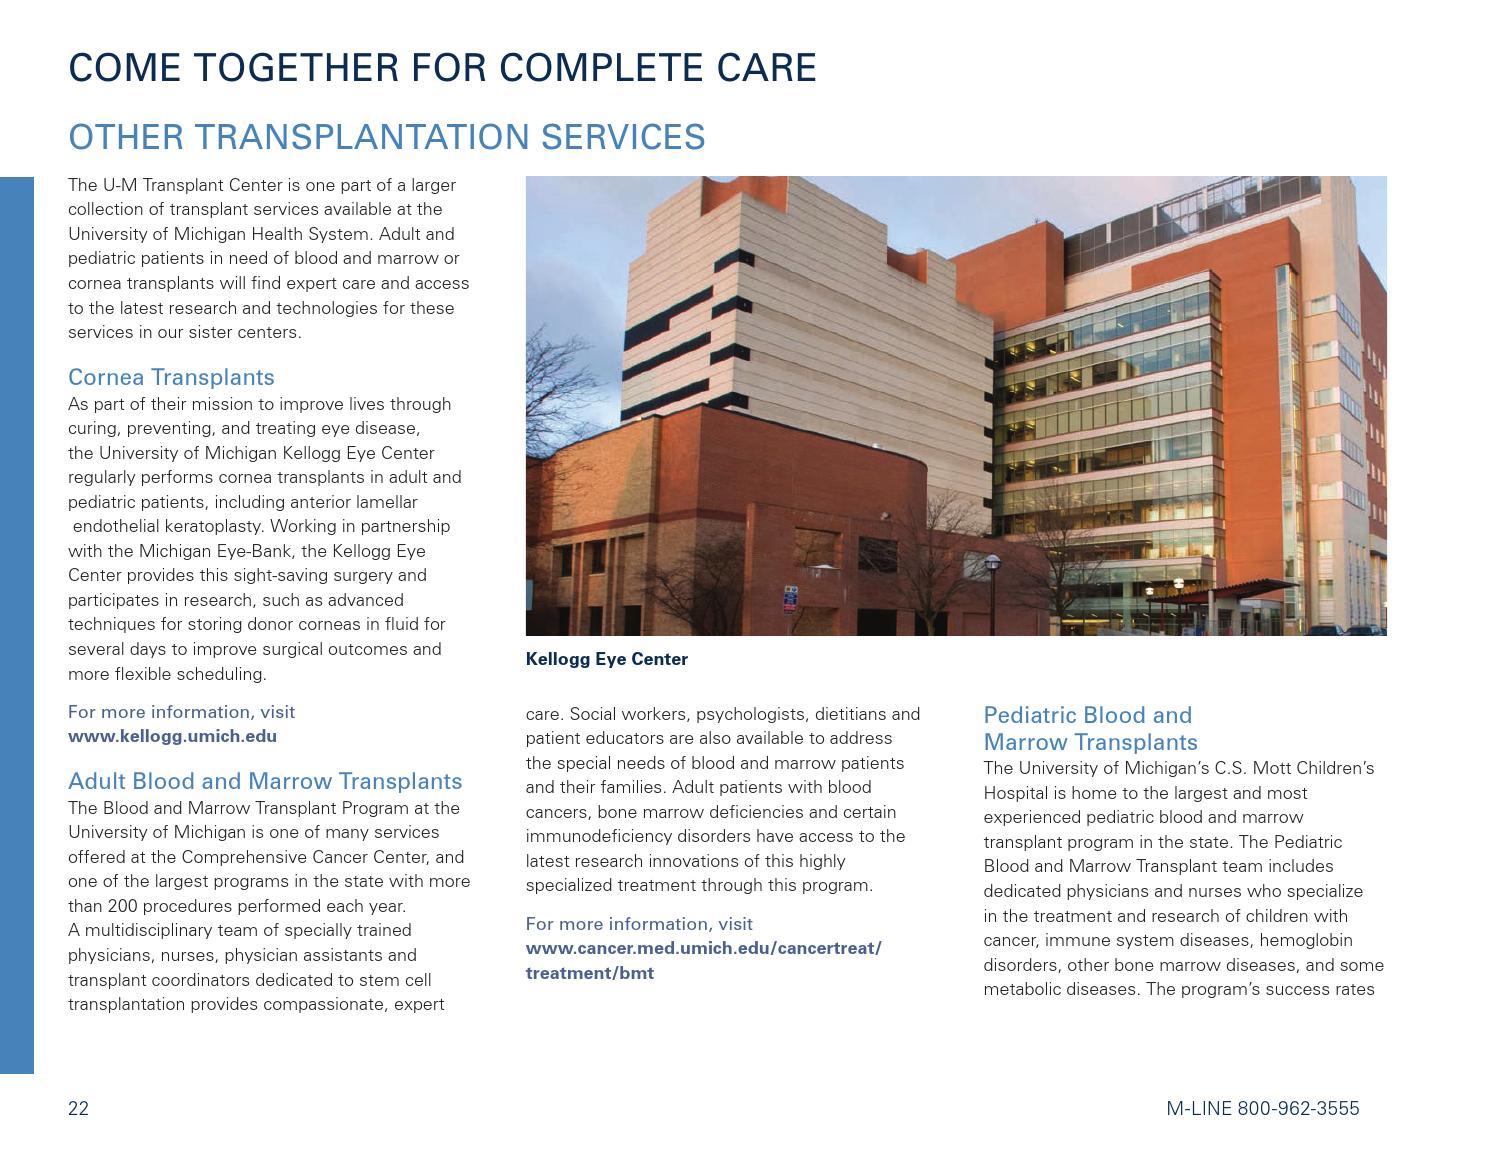 Transplant Center Outcomes 2013 by Michigan Medicine - issuu